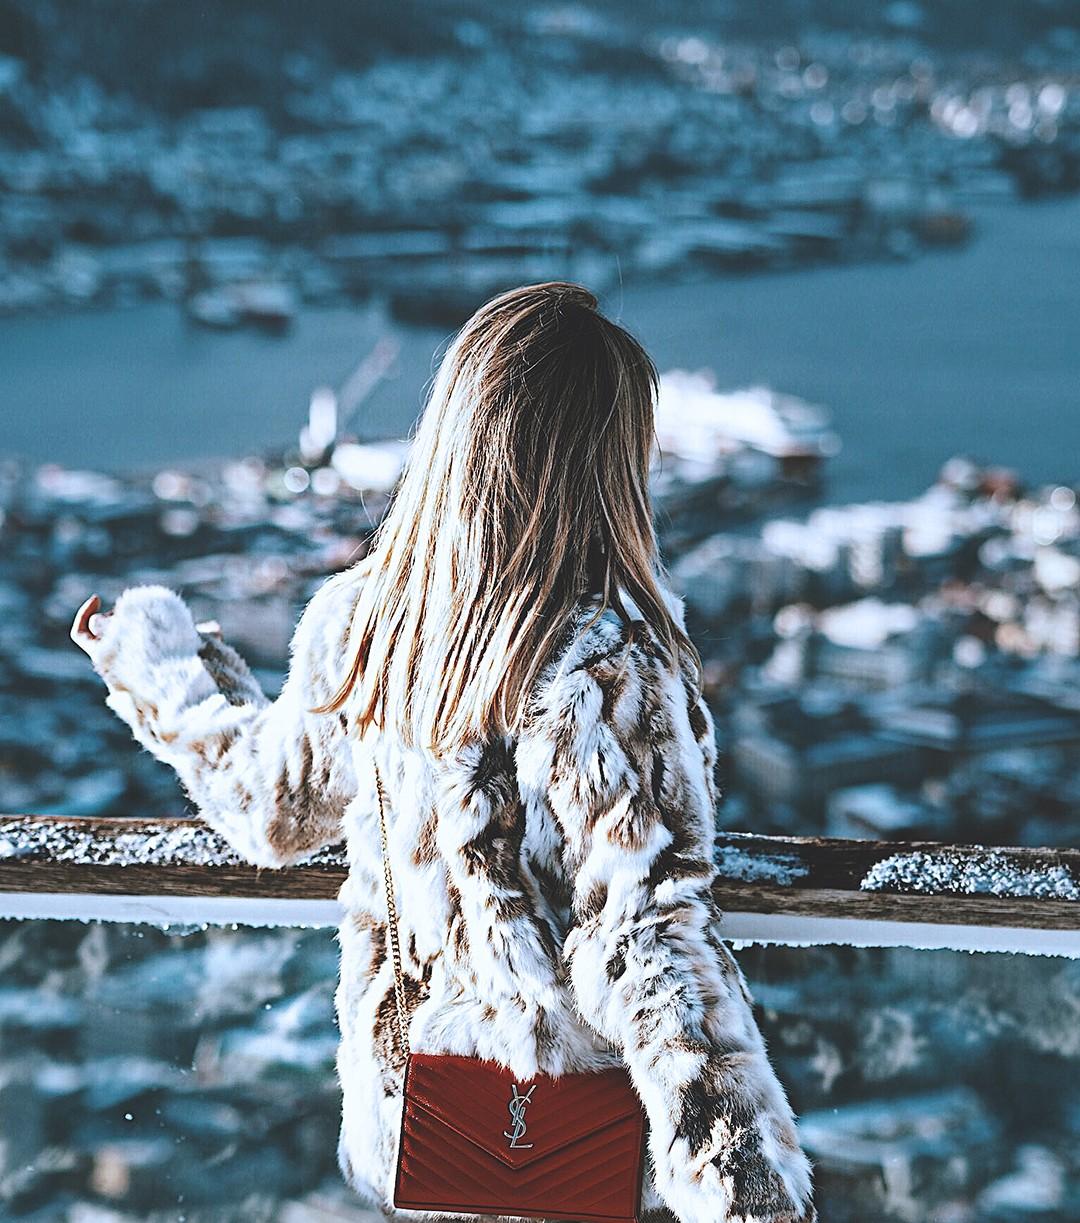 fjords-of-norway-Winter-Wonderland-fashion-blogger-Norway-Monica-SorsIMG_6451